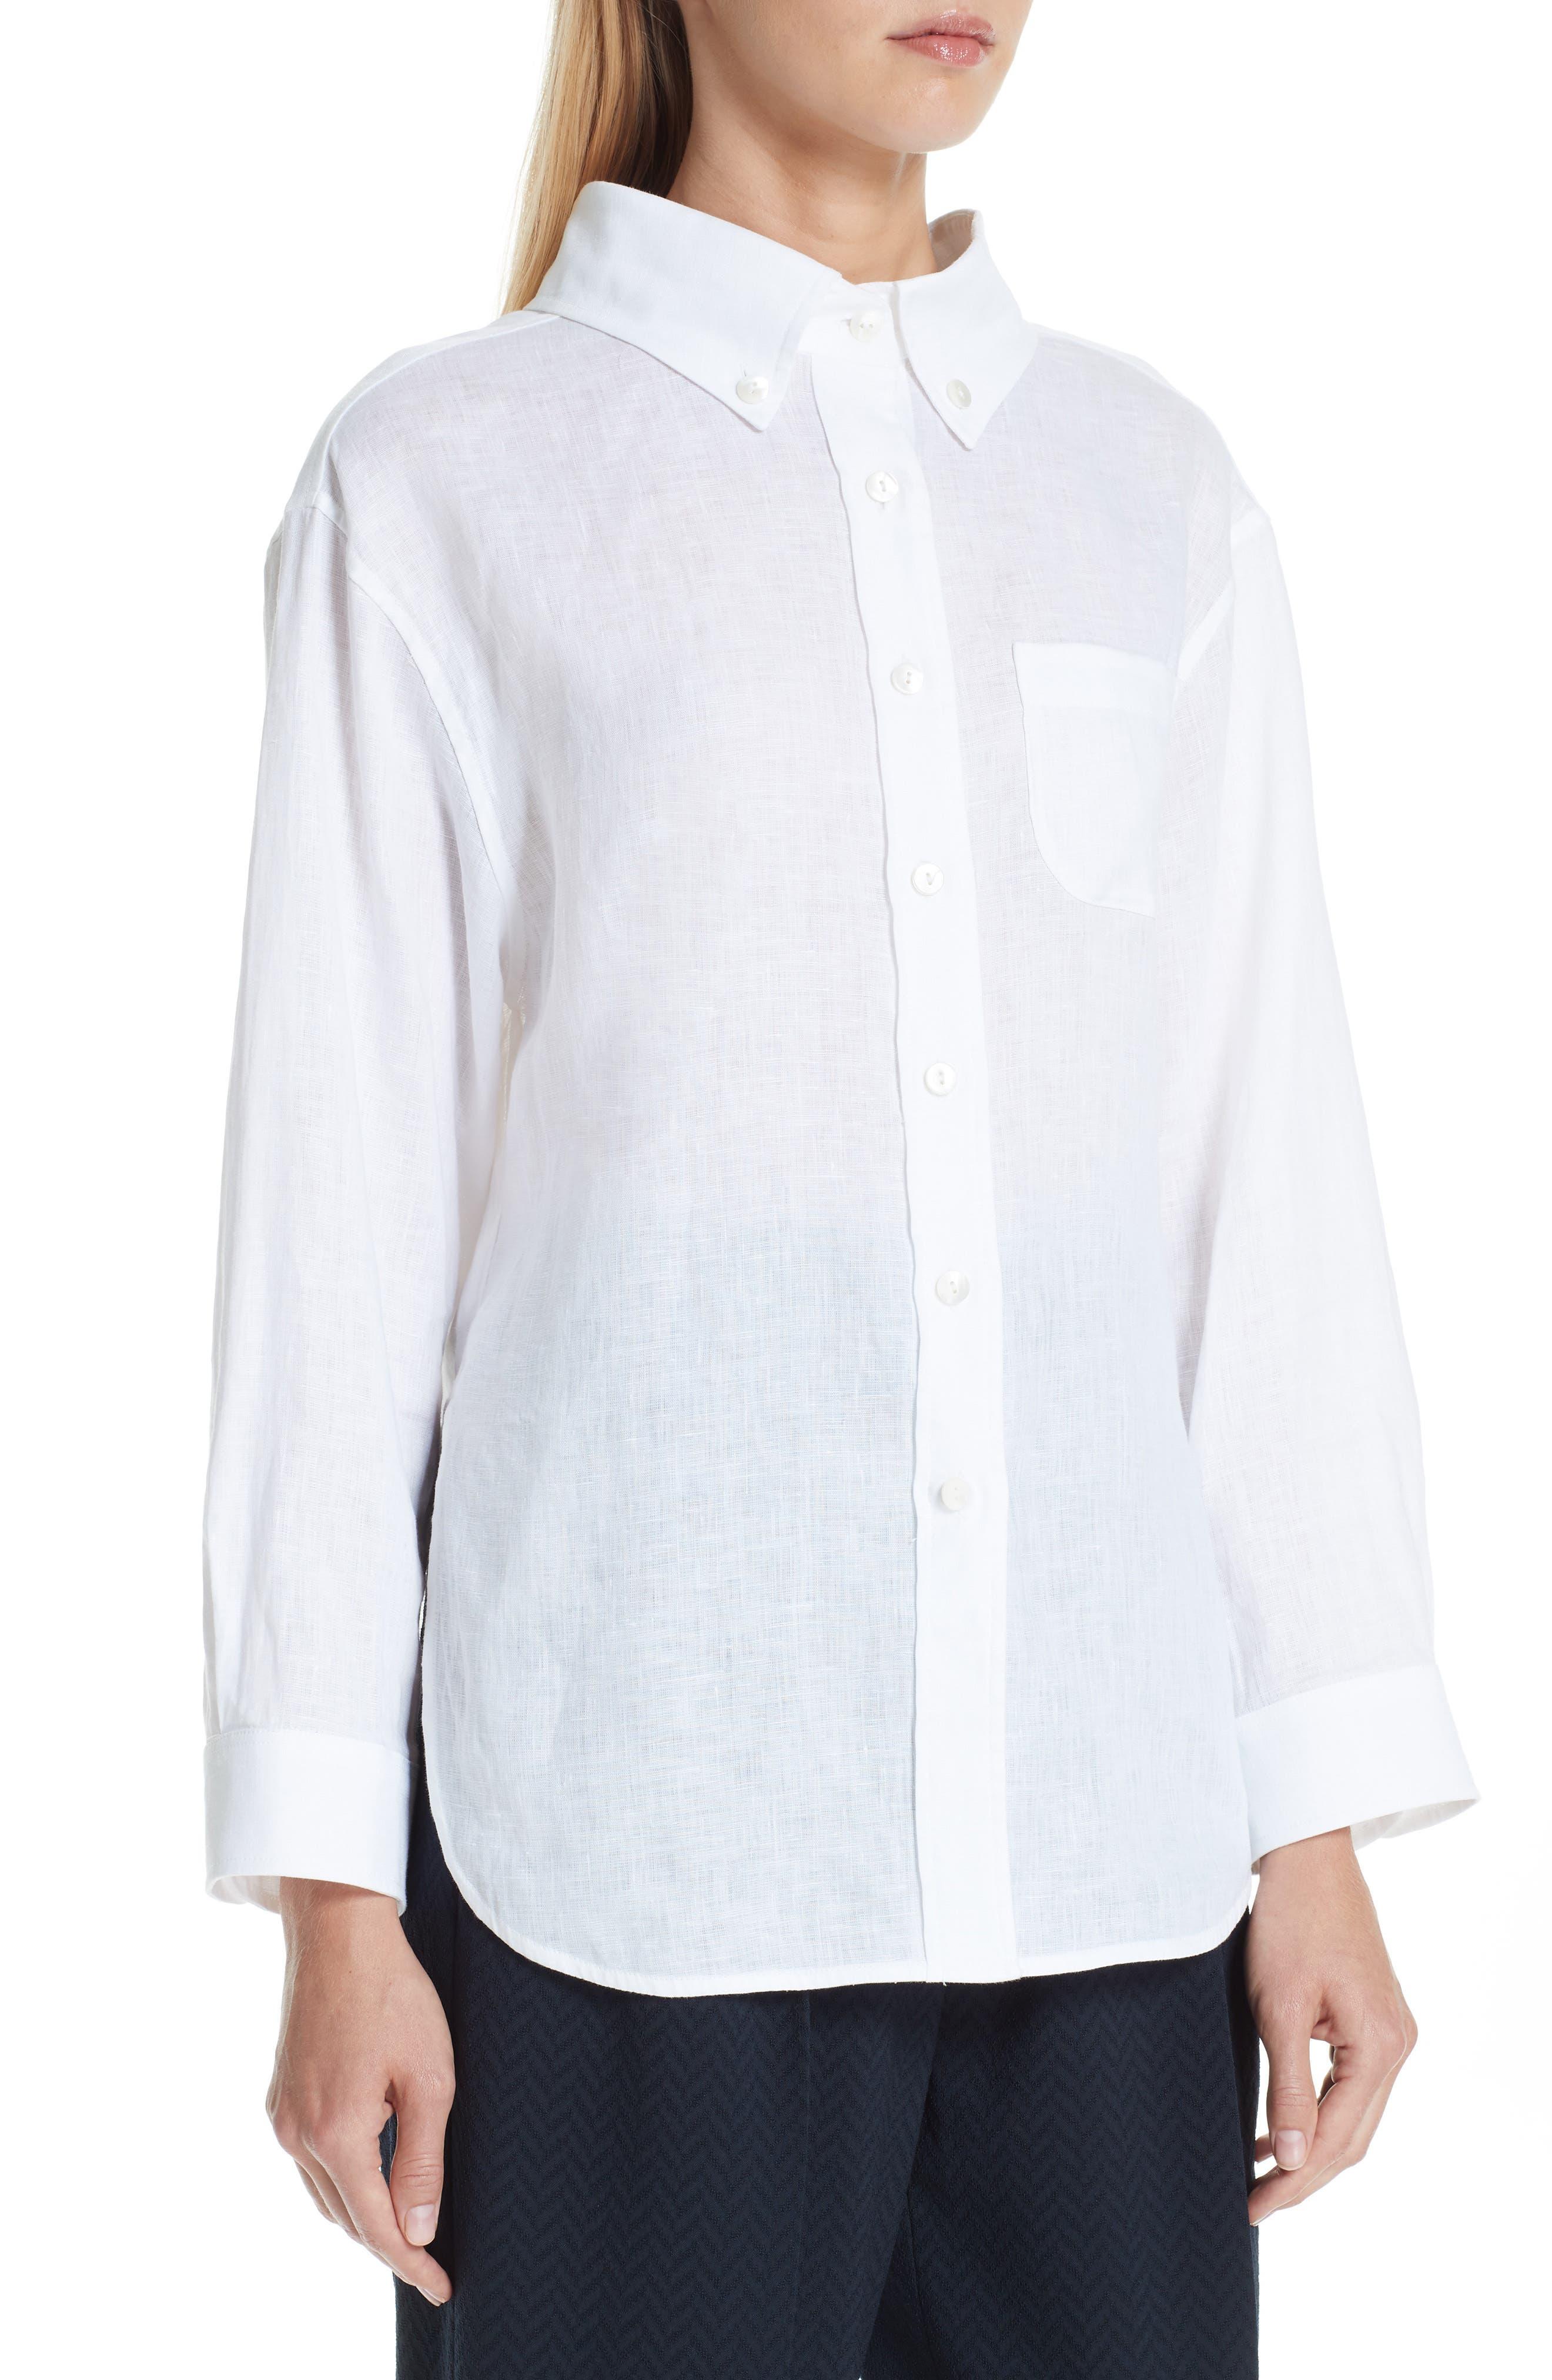 EMPORIO ARMANI,                             Long Sleeve Linen Blouse,                             Alternate thumbnail 4, color,                             BIANCO